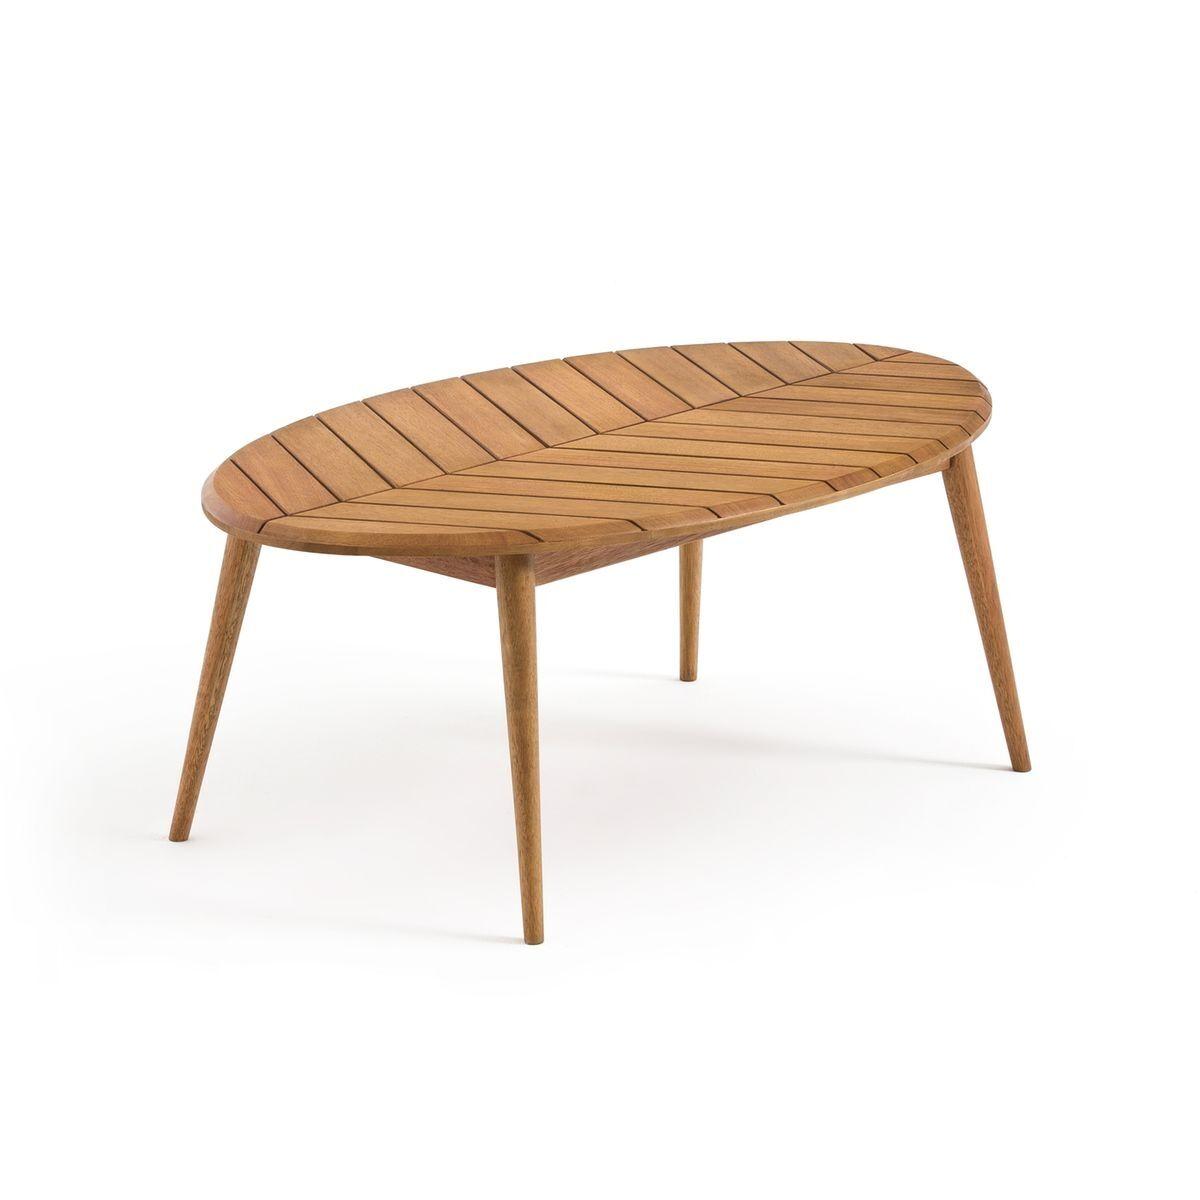 La Redoute Table basse de jardin eucalyptus FSC* MARSHAM - LA REDOUTE INTERIEURS